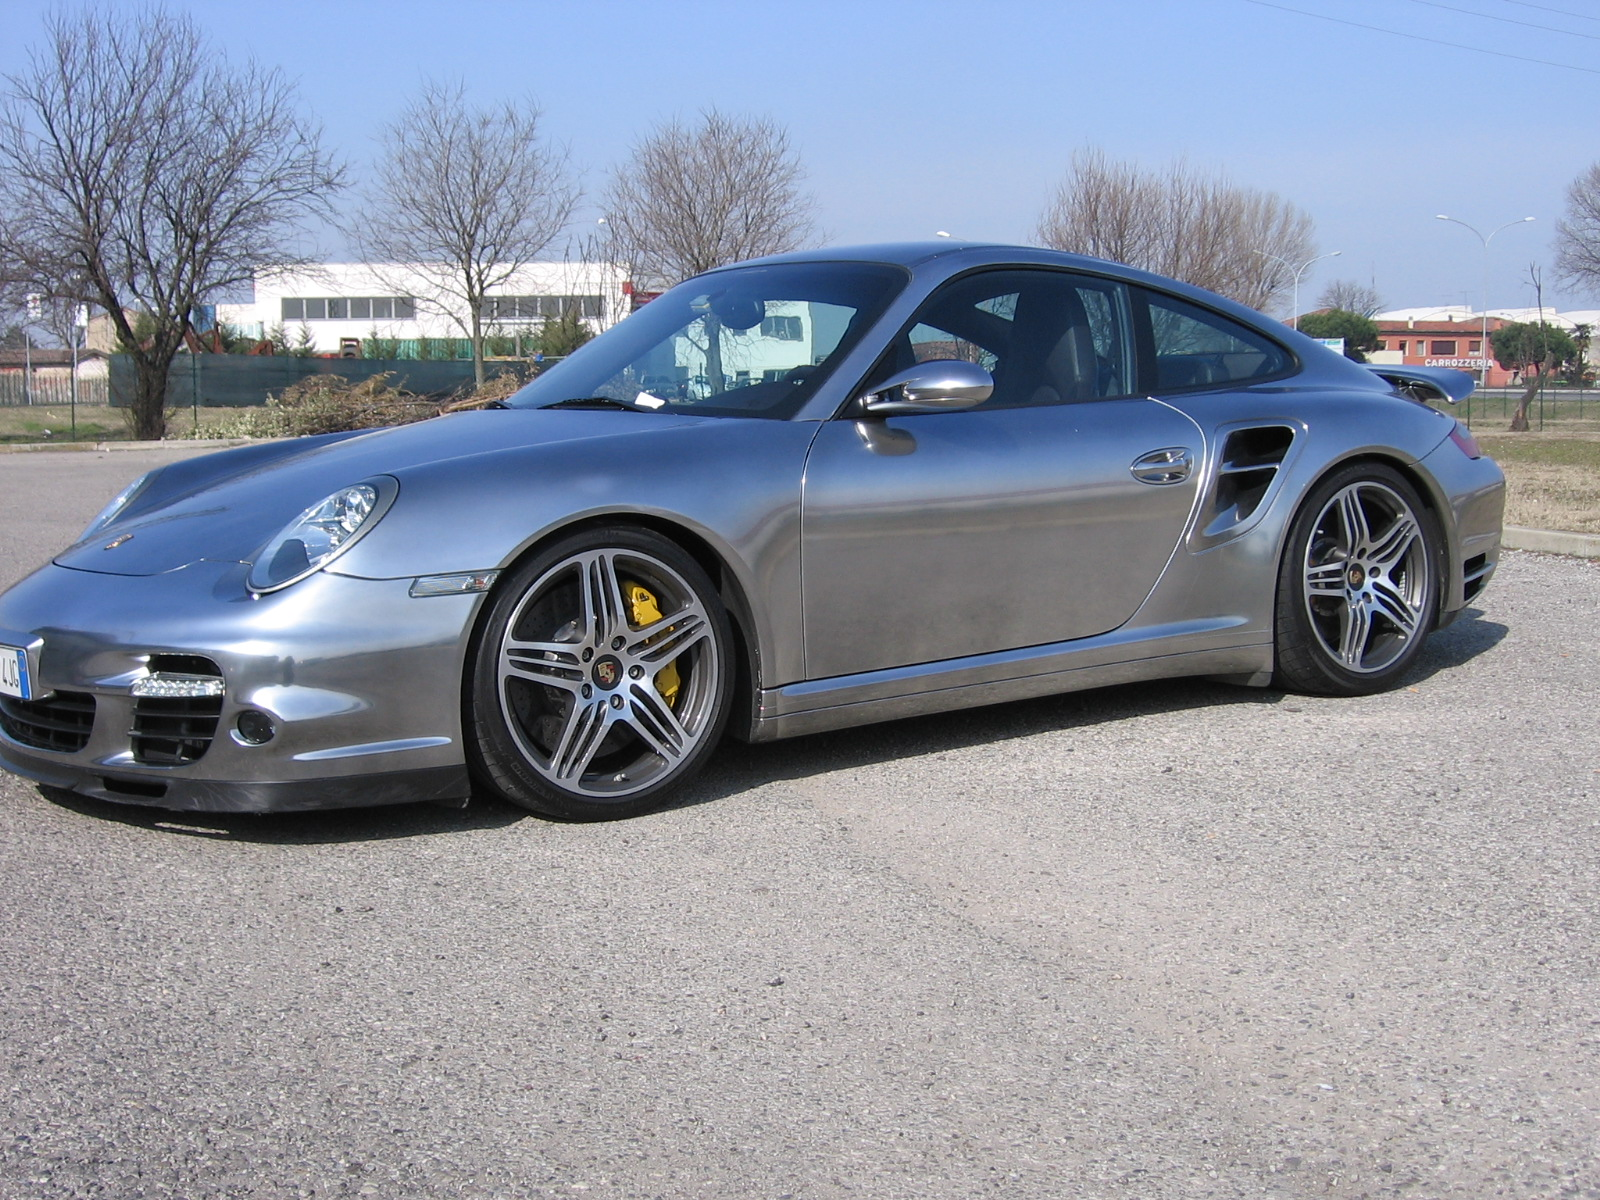 Porsche 997 Turbo cromata